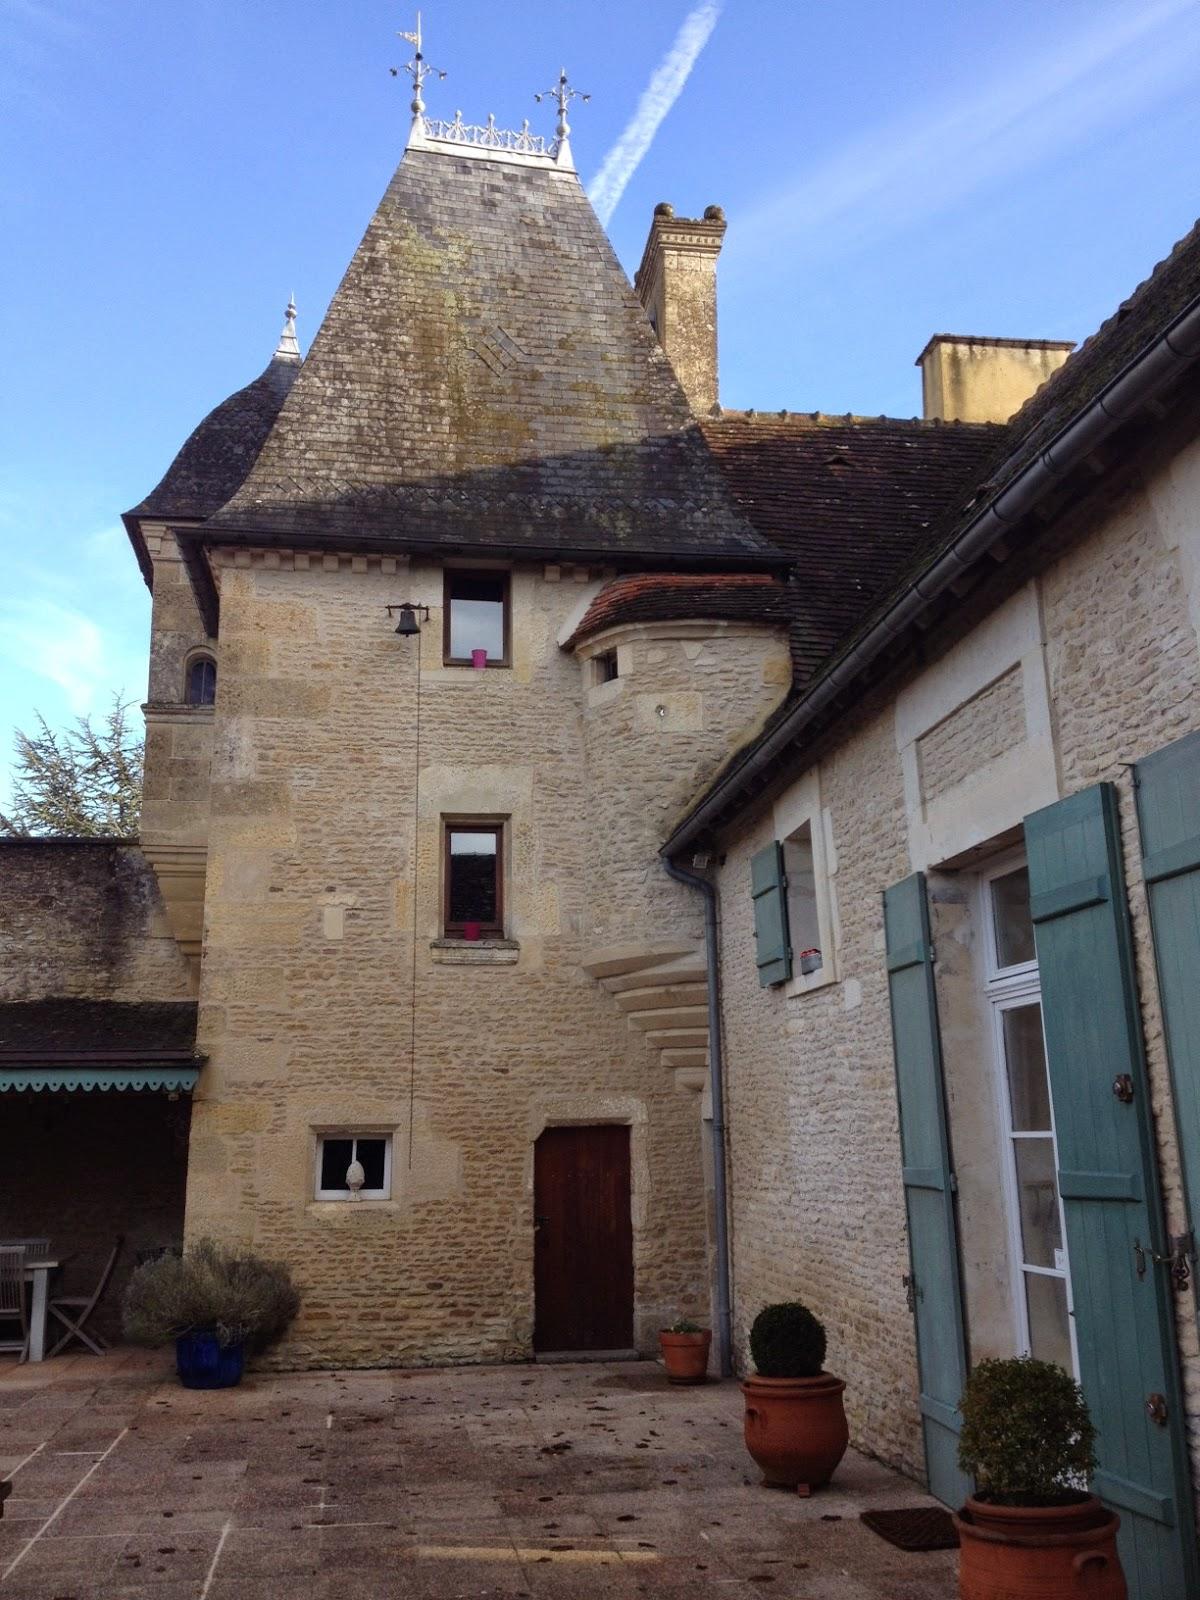 http://www.globeshoppeuse.com/2014/12/manoir-de-beaurepaire-normandie.html